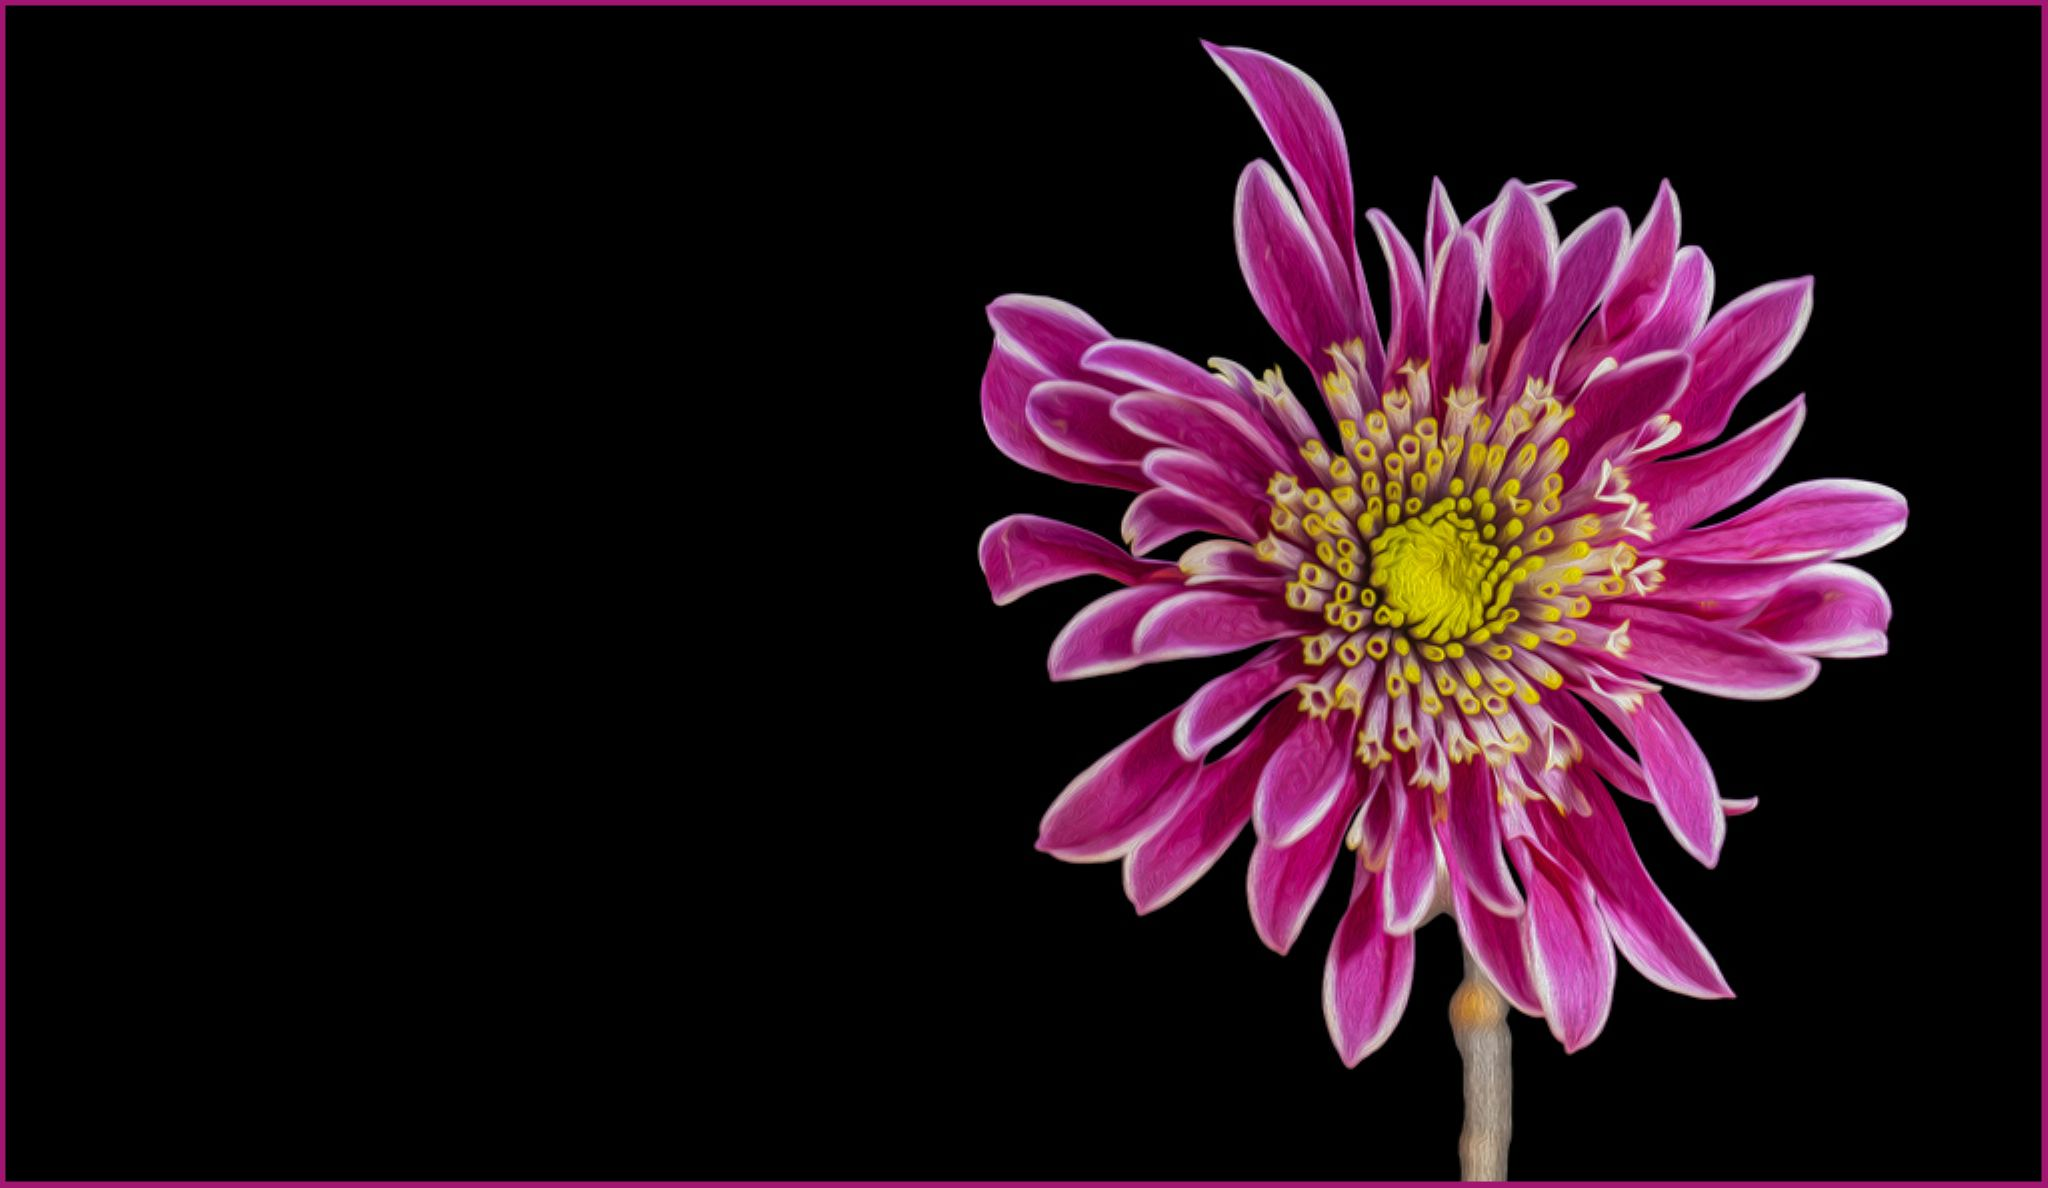 Painted Chrysanthemum by Steve Smith